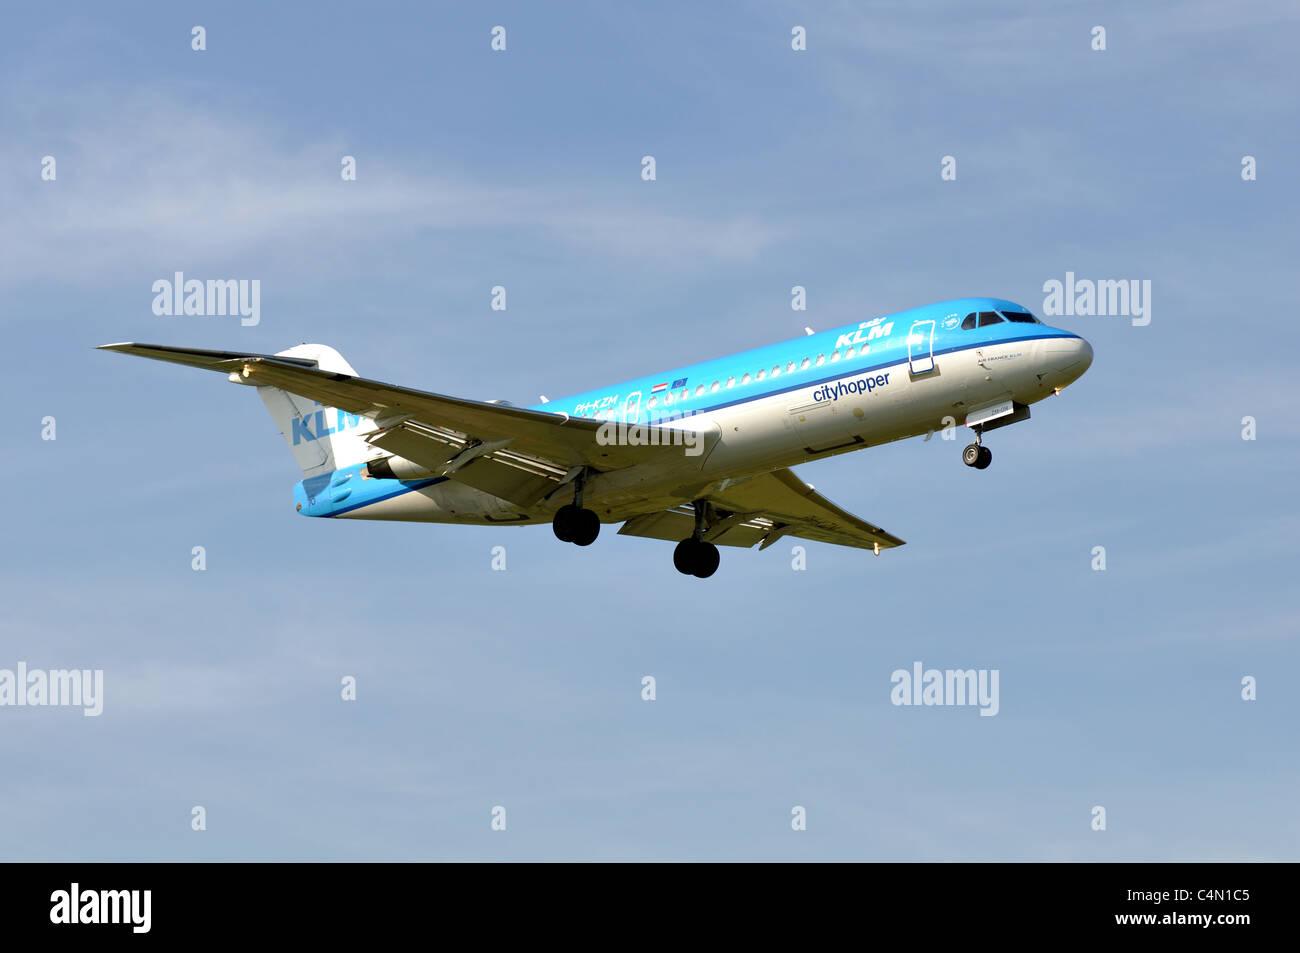 KLM Cityhopper Fokker 70 aircraft approaching Birmingham Airport, UK - Stock Image